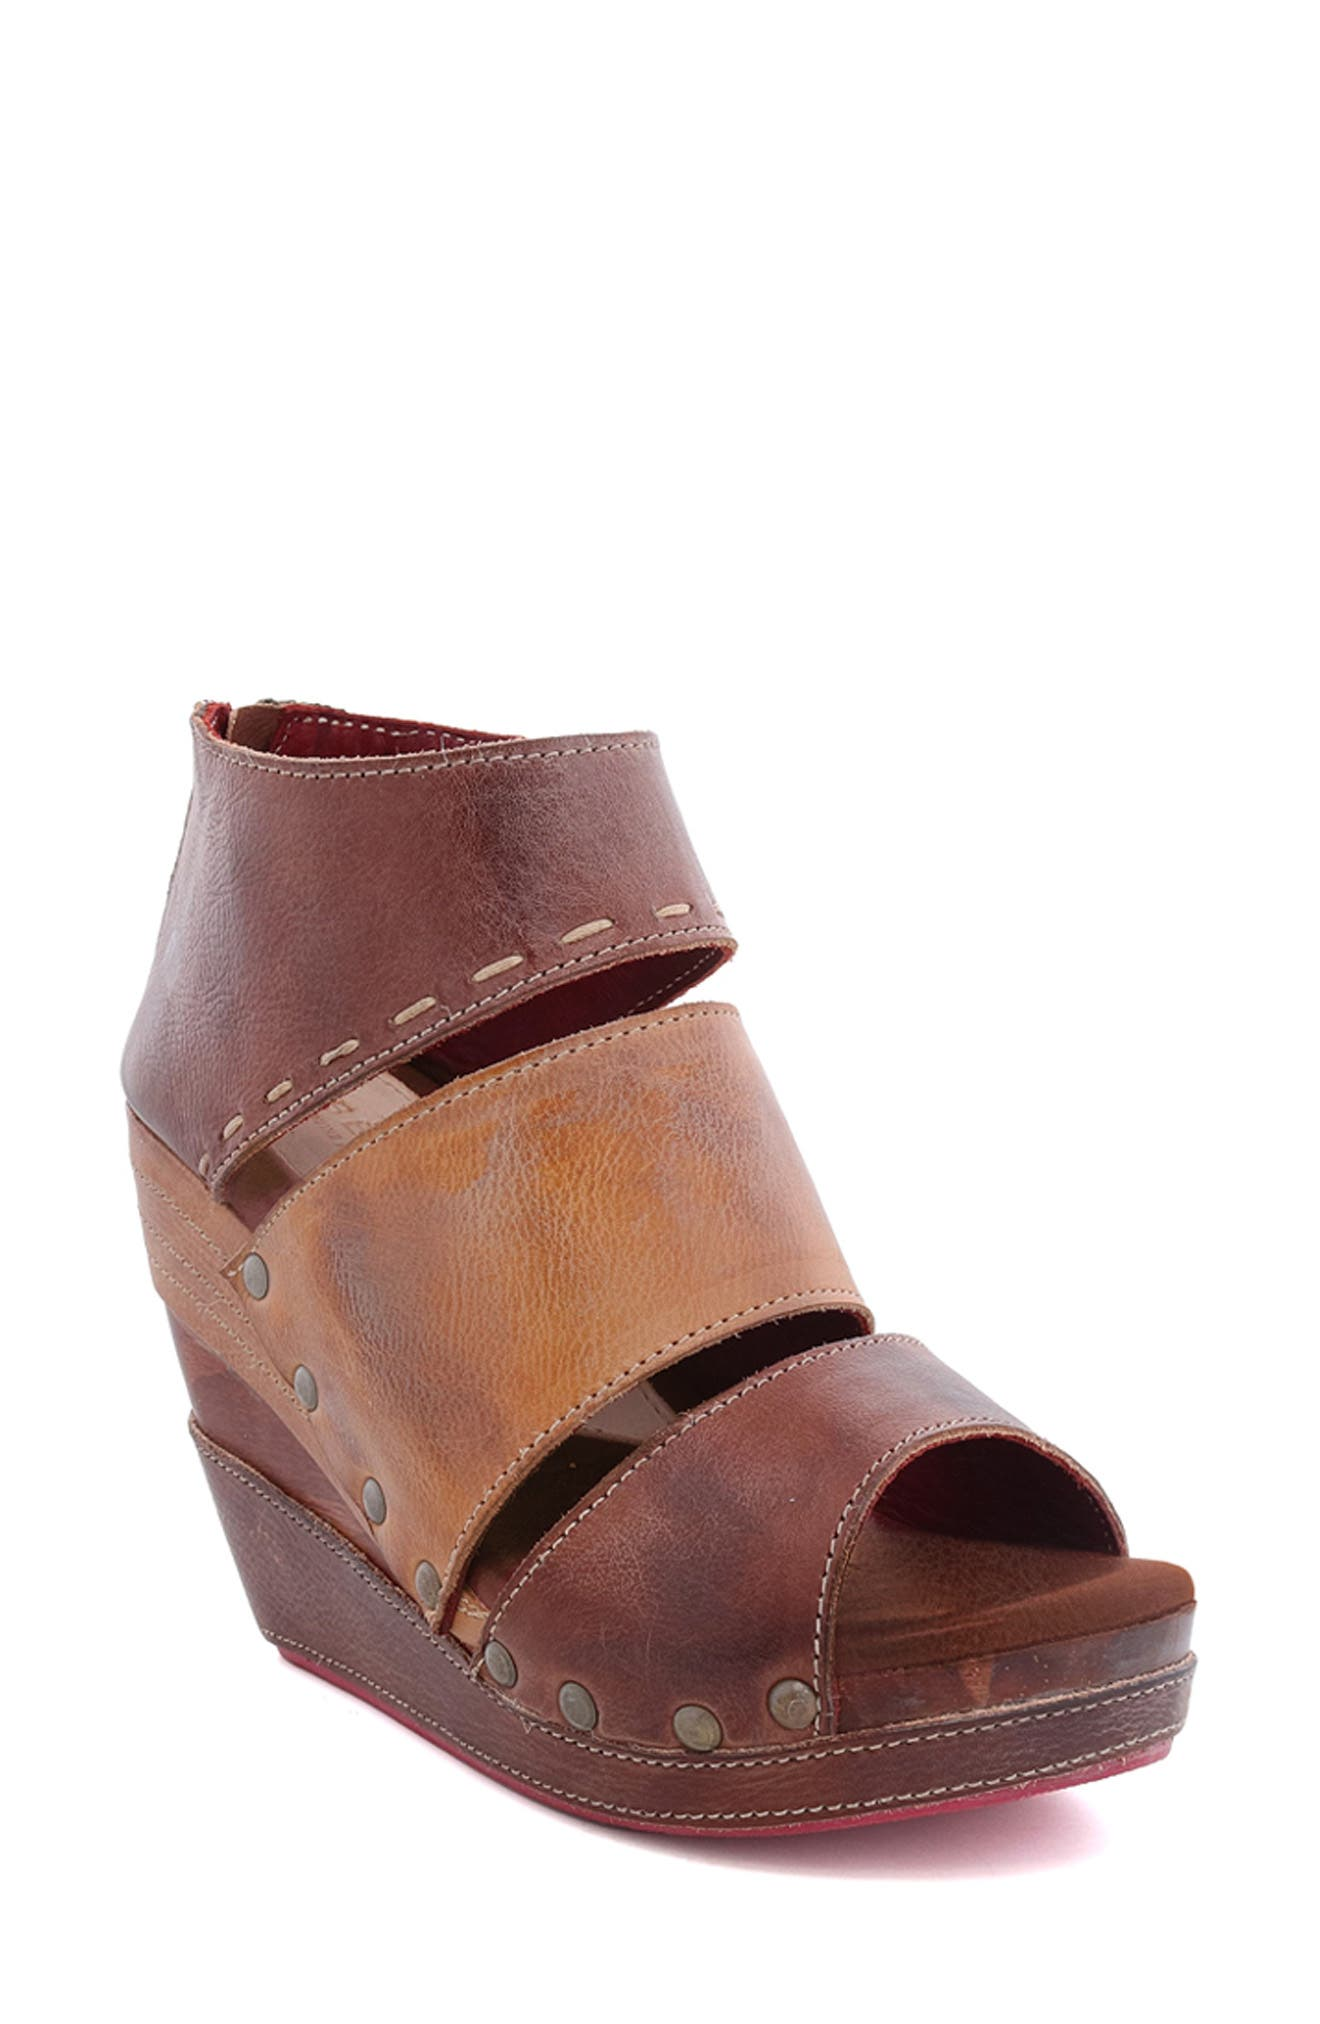 Jessie Wedge Sandal